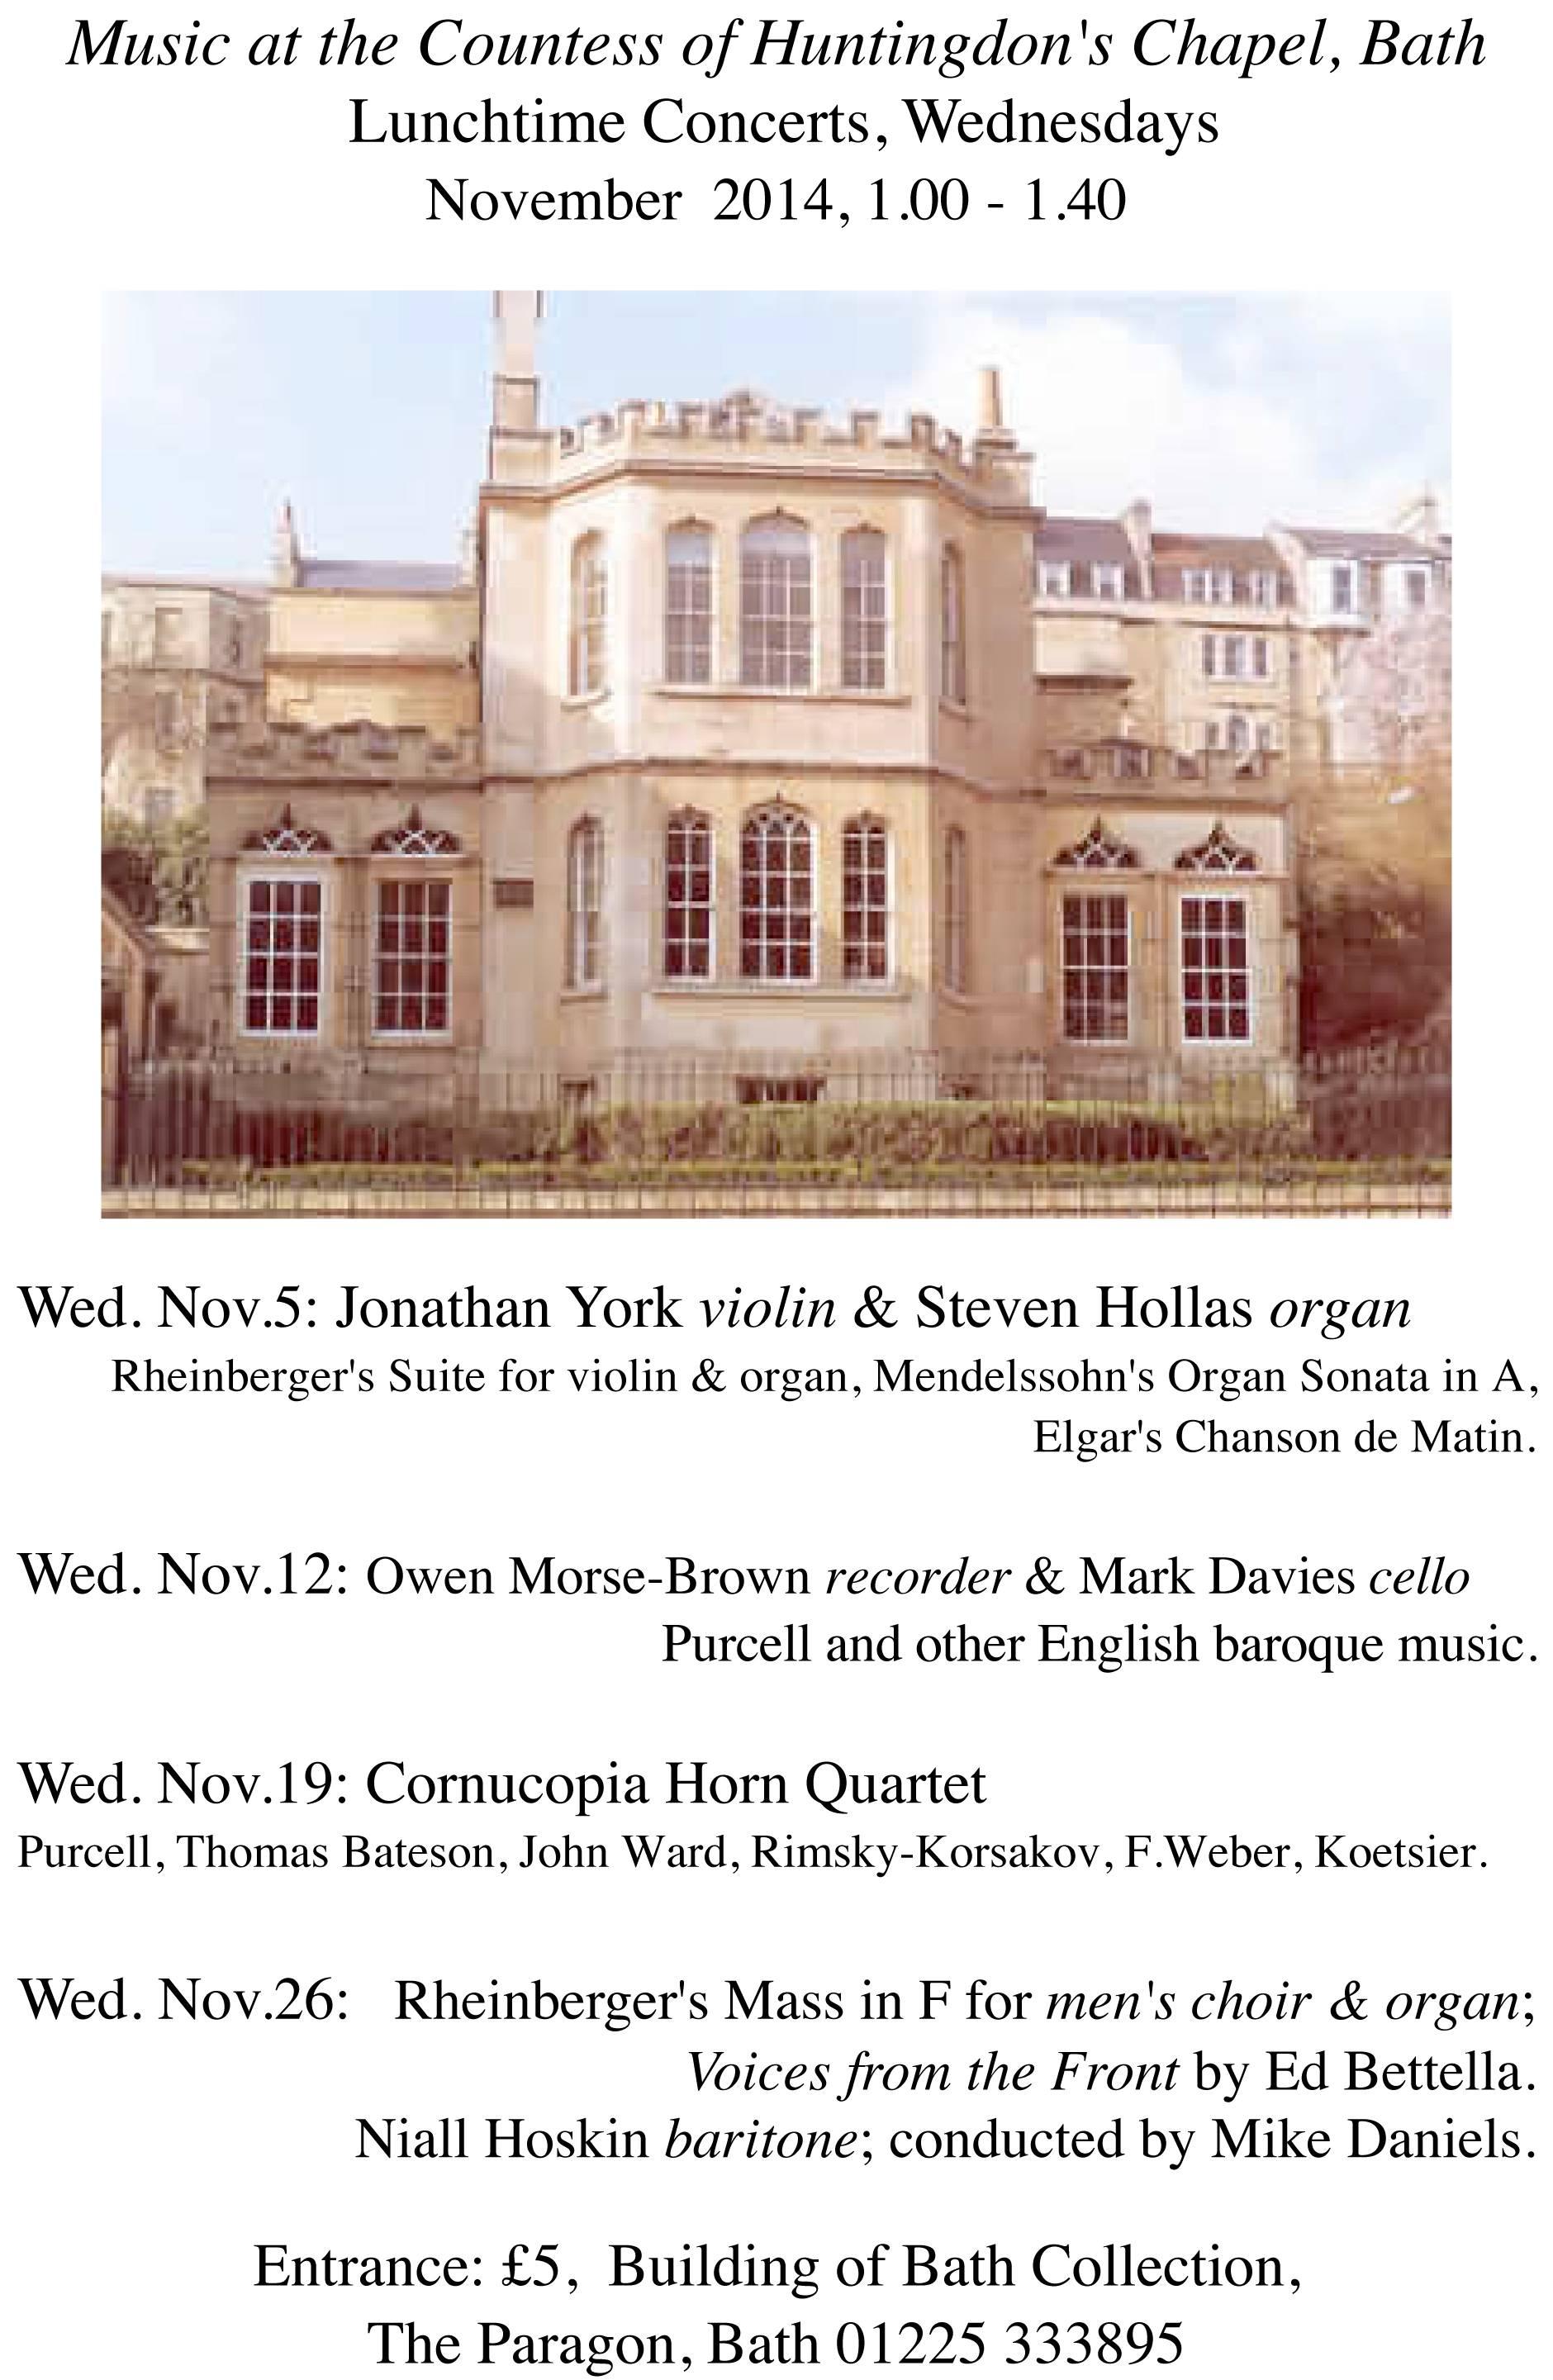 Steven Hollas Concert Series, Building of Bath Collection